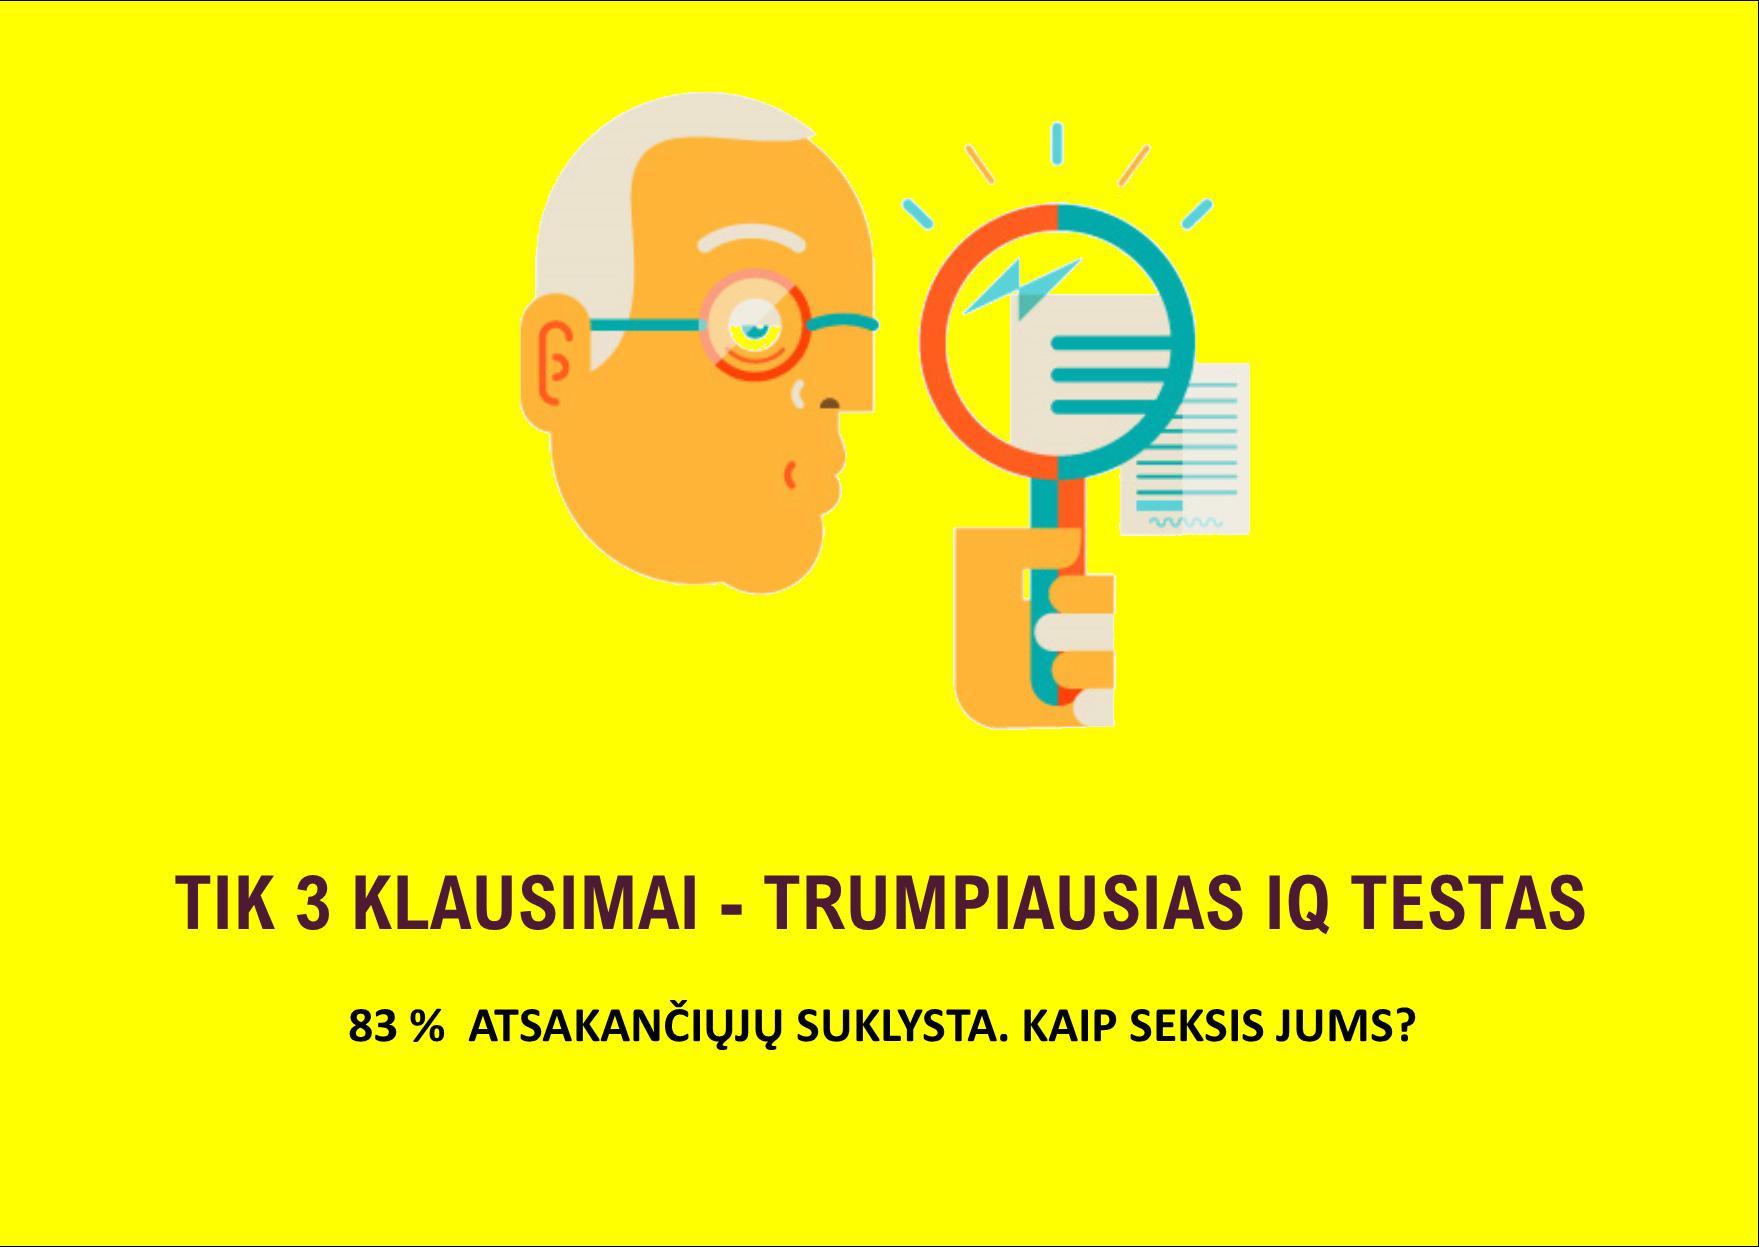 CRT_trumpiausias_IQ_testas.png